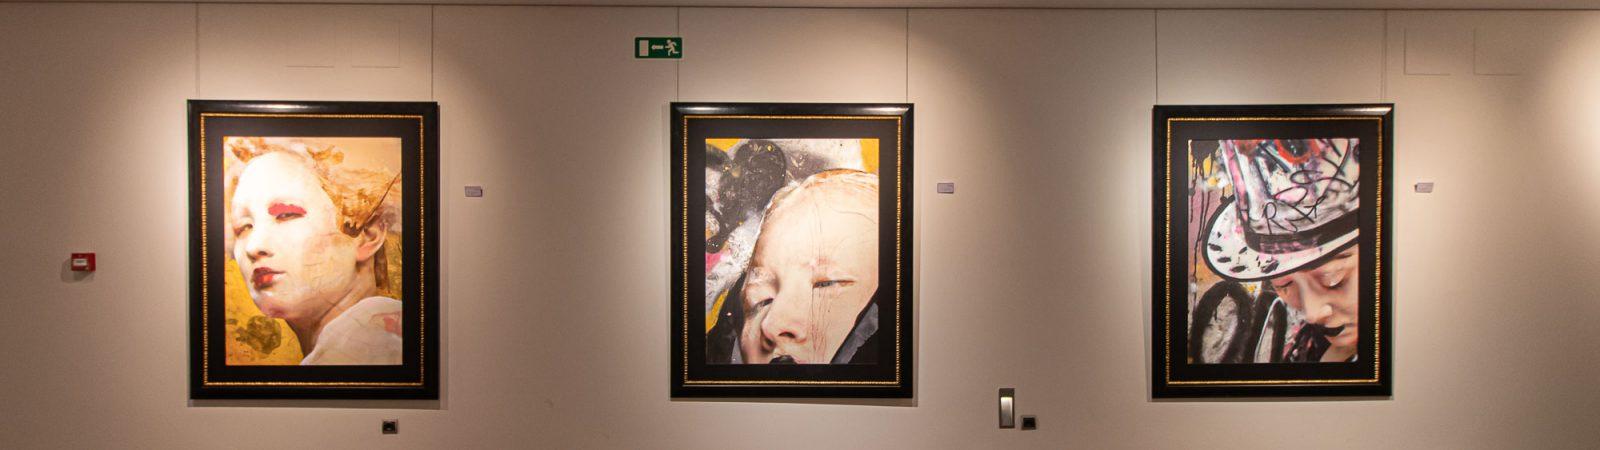 Lita-Cabellut-galeria-cortabitarte-2